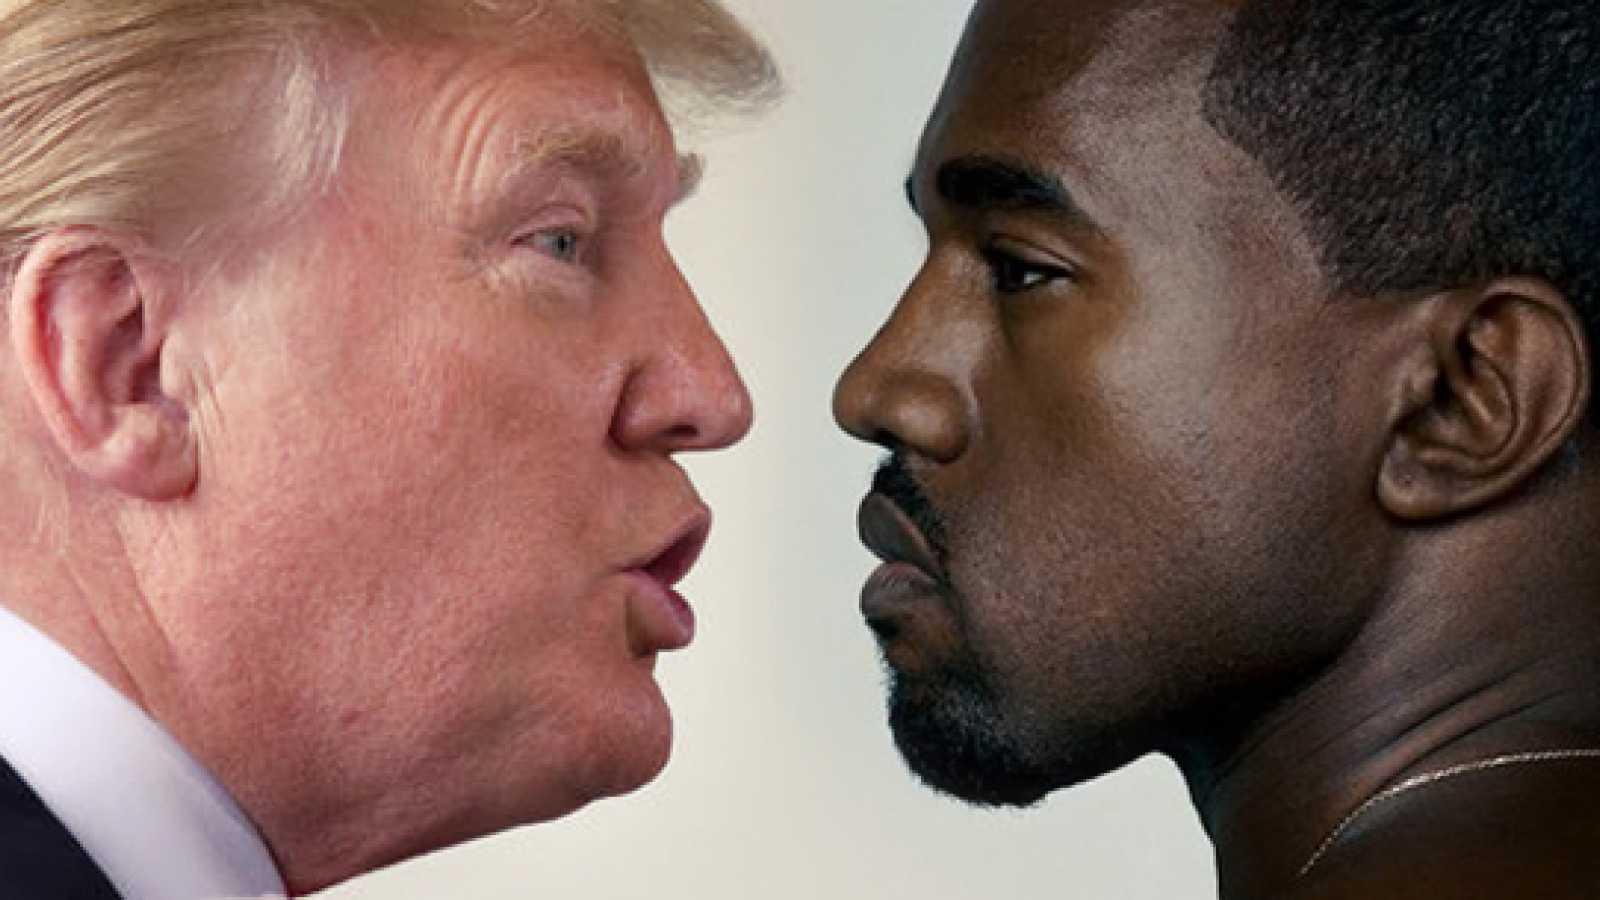 donald trump vs tom ford plus zayn malik lous tomlinson truce 2017 images